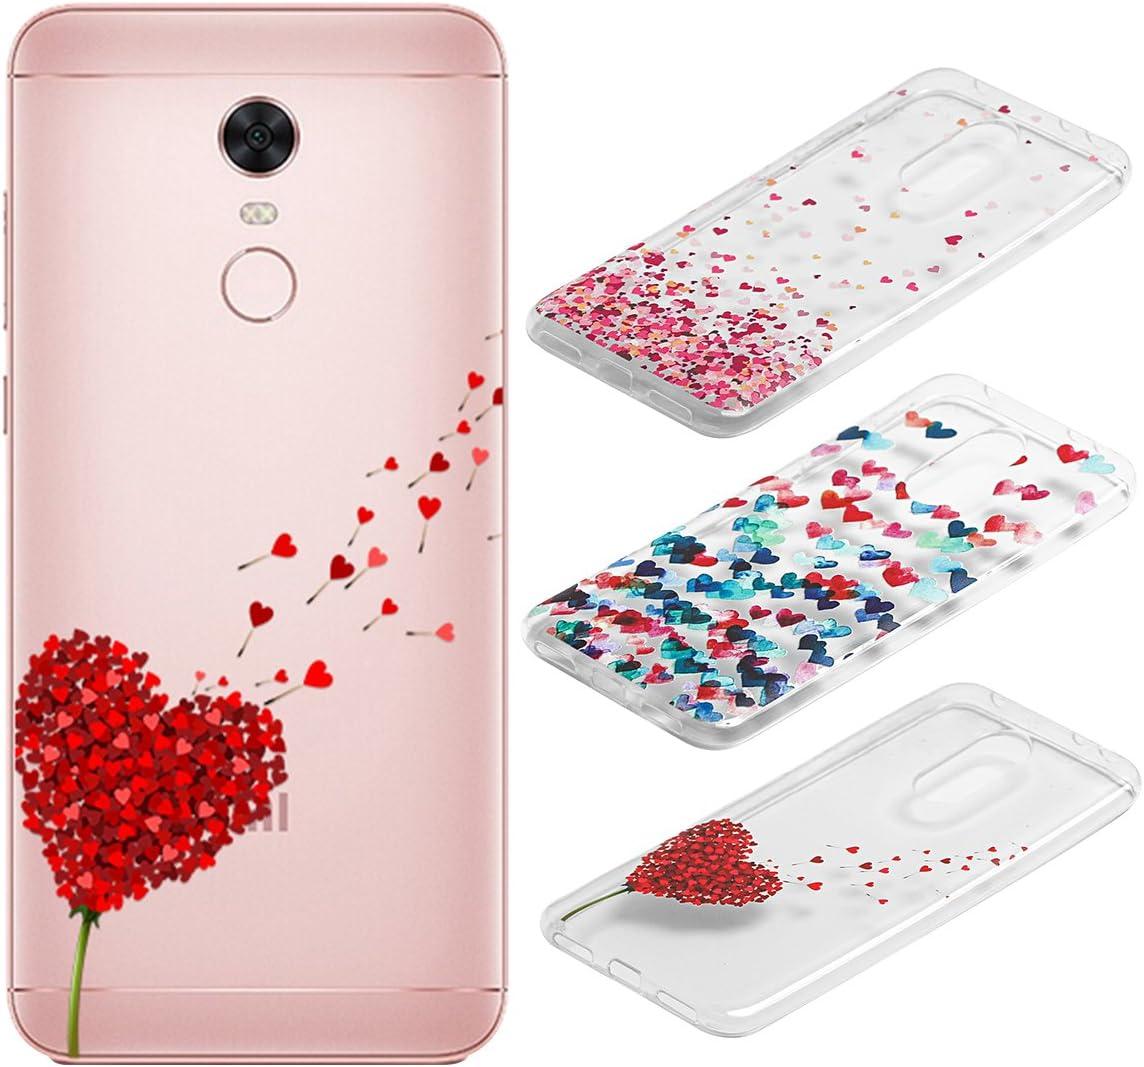 [3 Pack] Funda Xiaomi Redmi 5 Plus, Weideworld 3D Patrón Flexible Ultra Slim TPU Silicona Back Carcasa Funda para Xiaomi Redmi 5 Plus, Amor